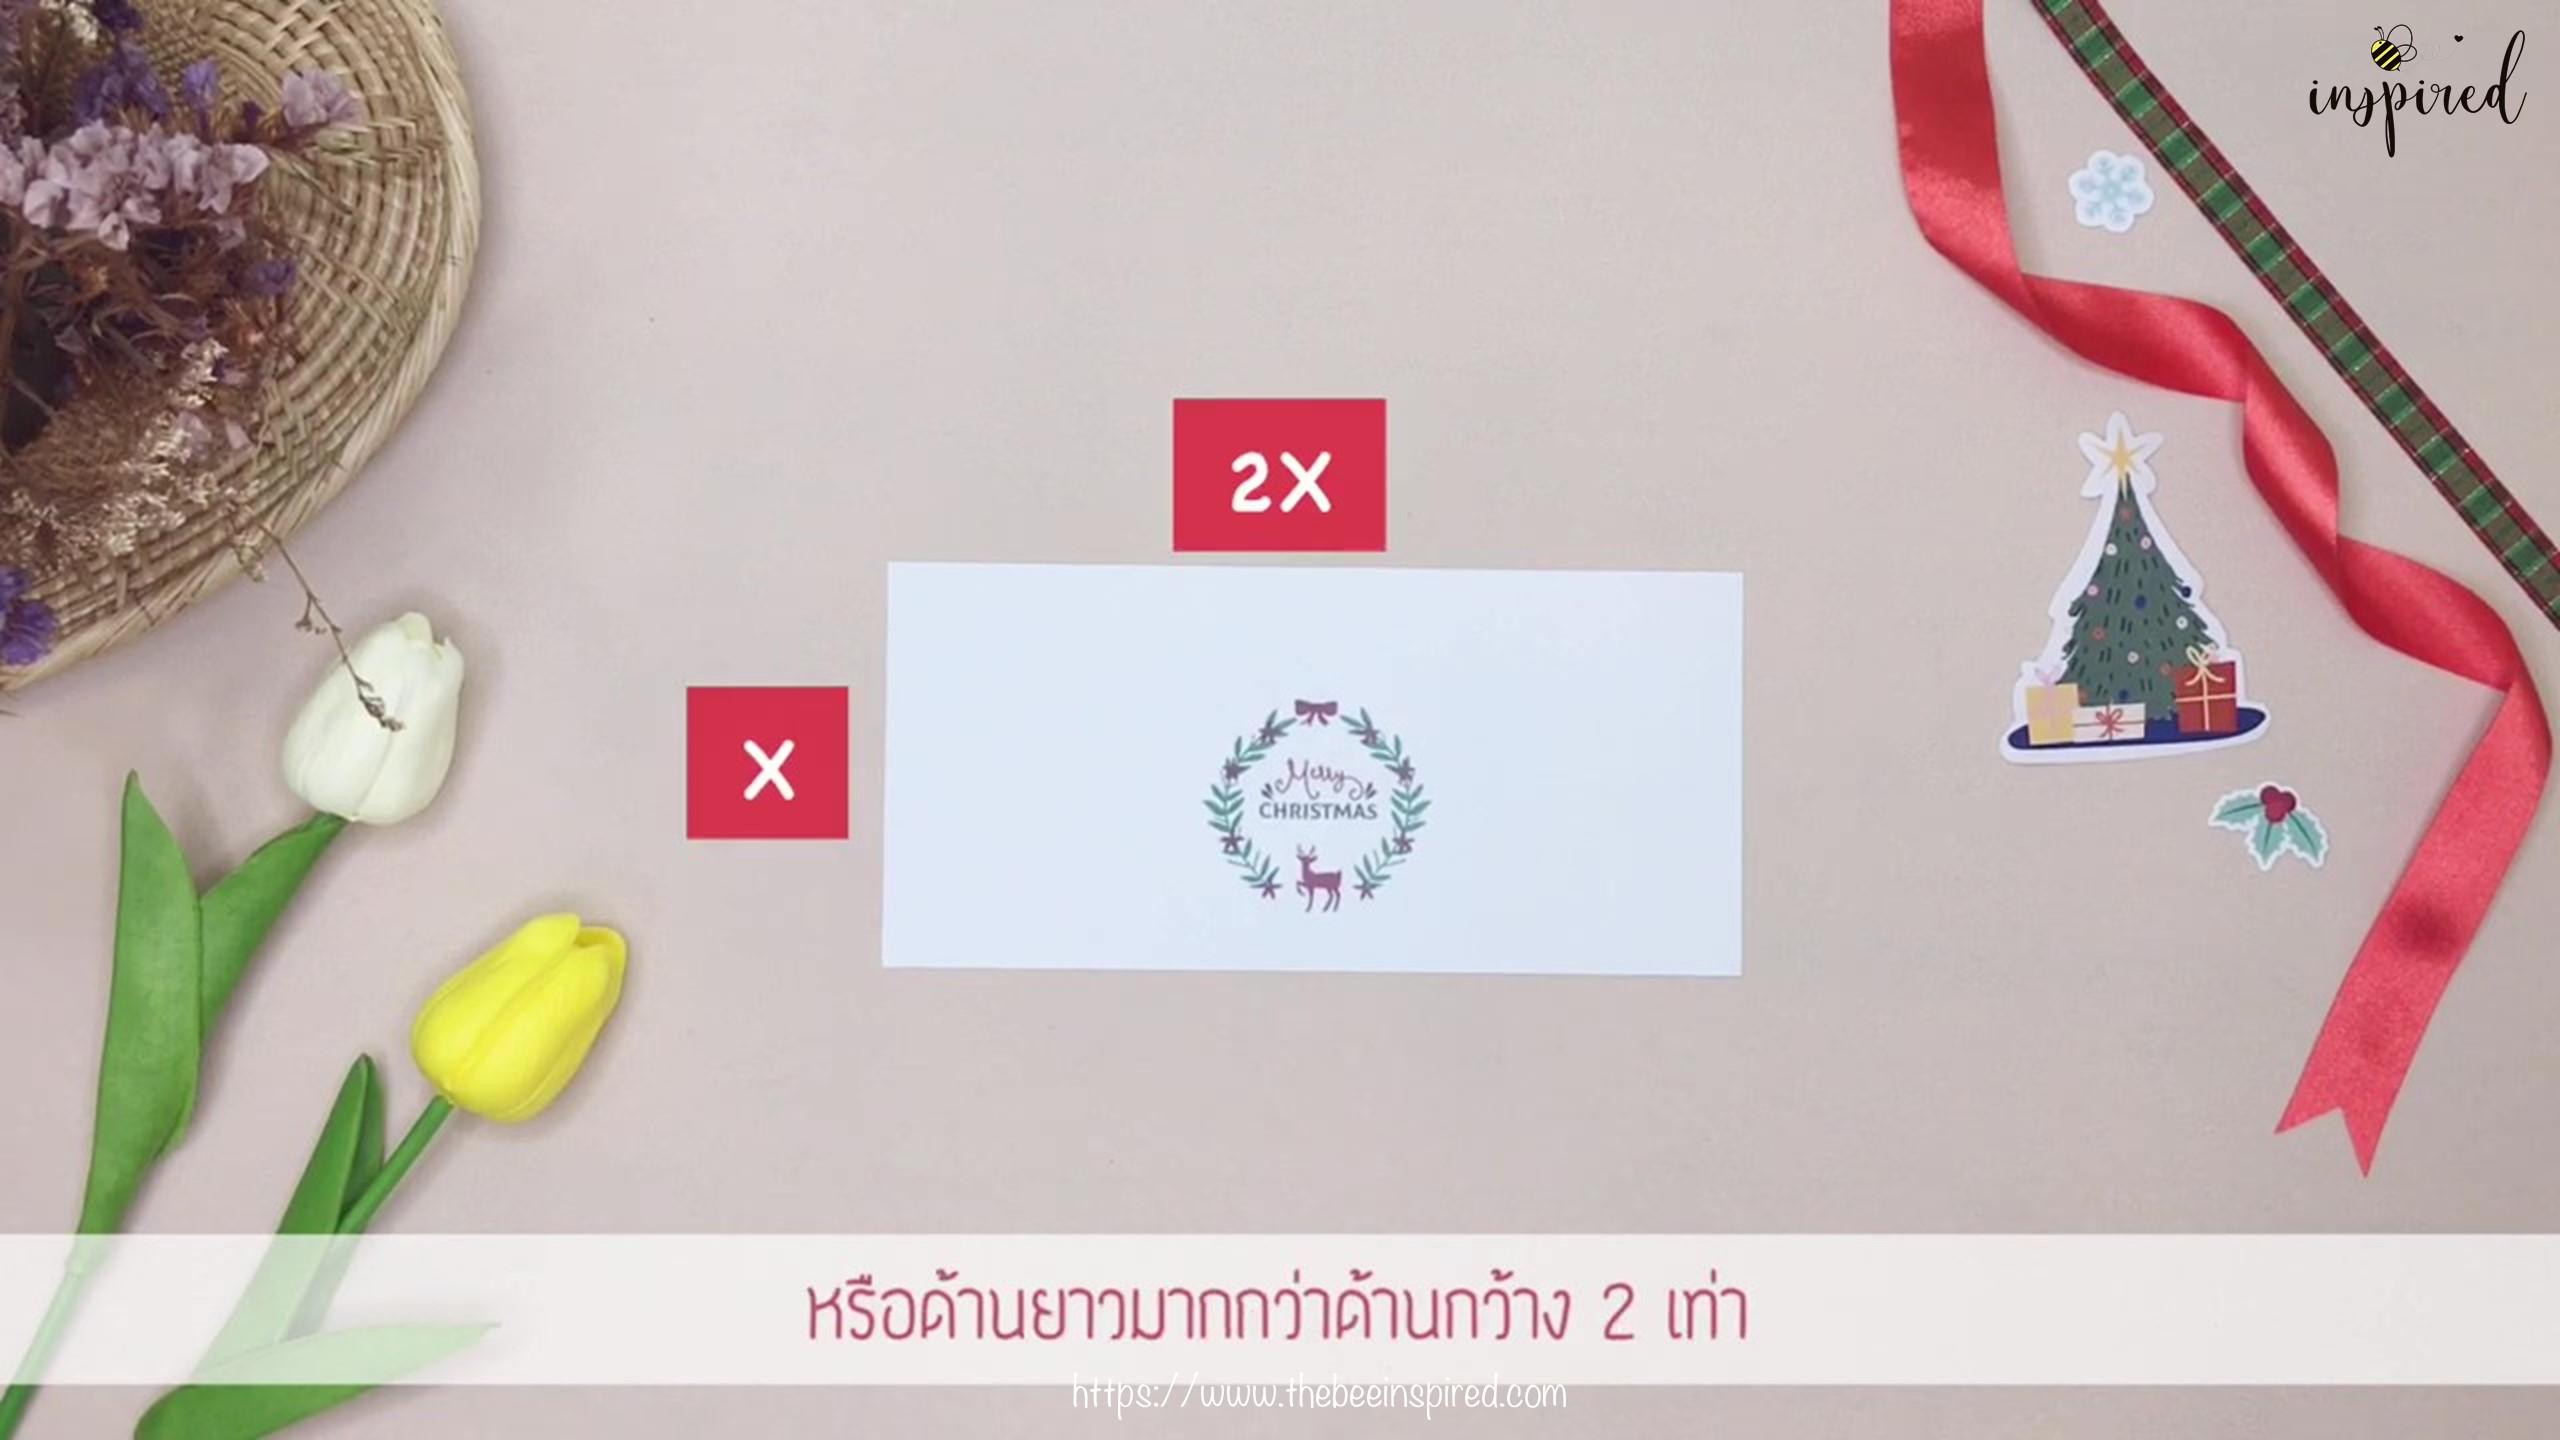 DIY วิธีทำถุงของขวัญวันวาเลนไทน์สามเหลี่ยม_ How to Wrap Gift in Triangle Shape for Valentine_1